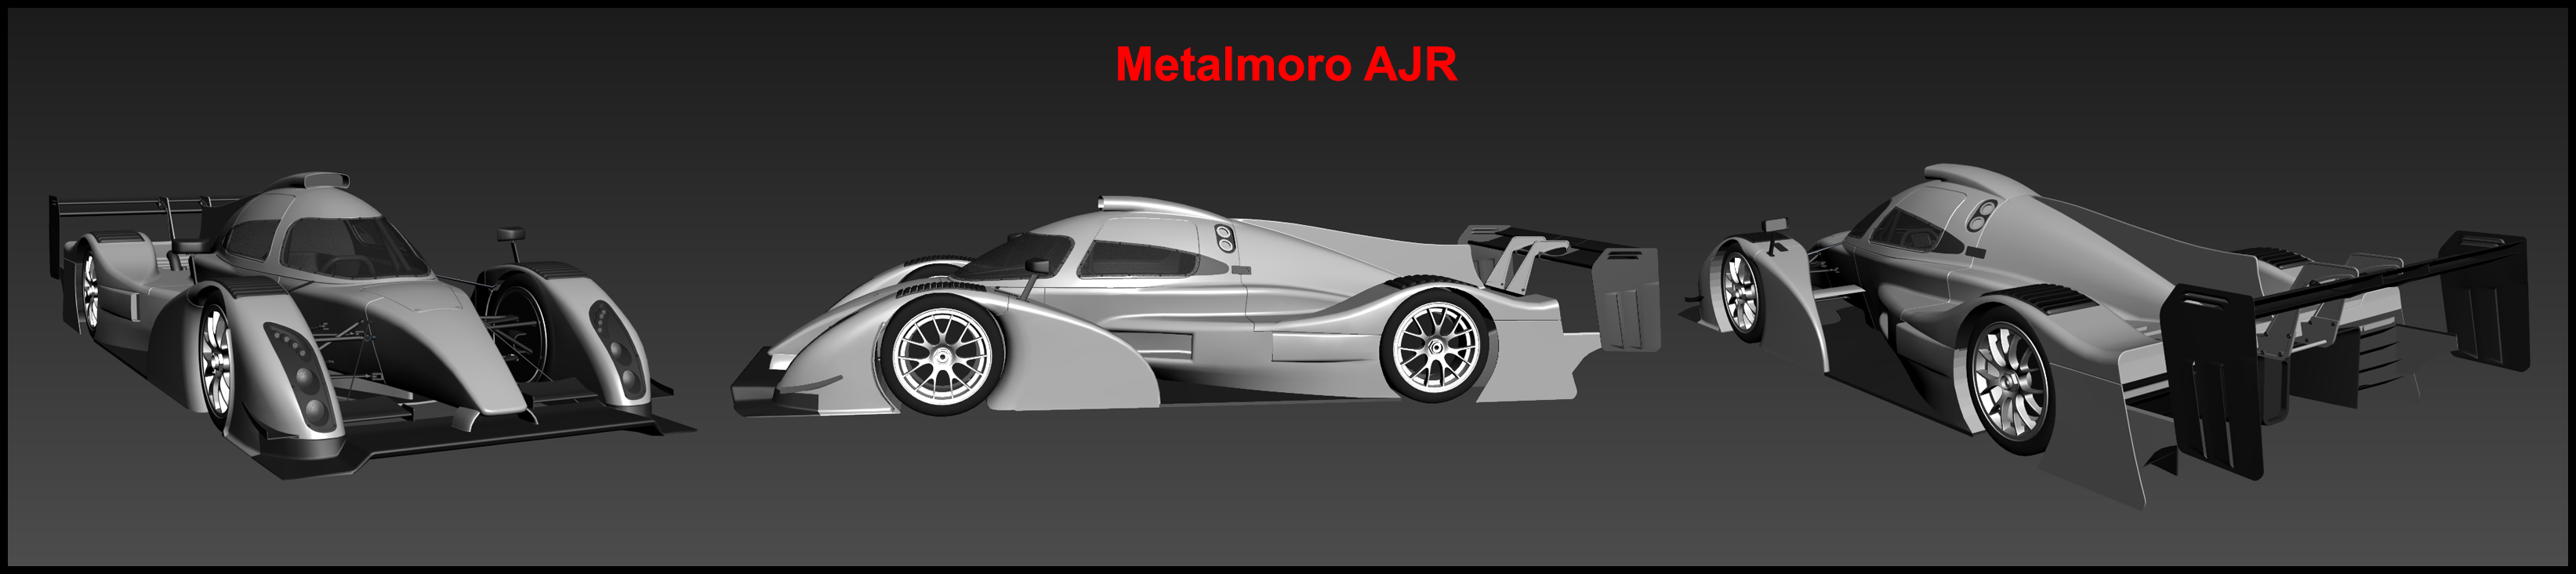 Metalmoro AJR_WIP.jpg